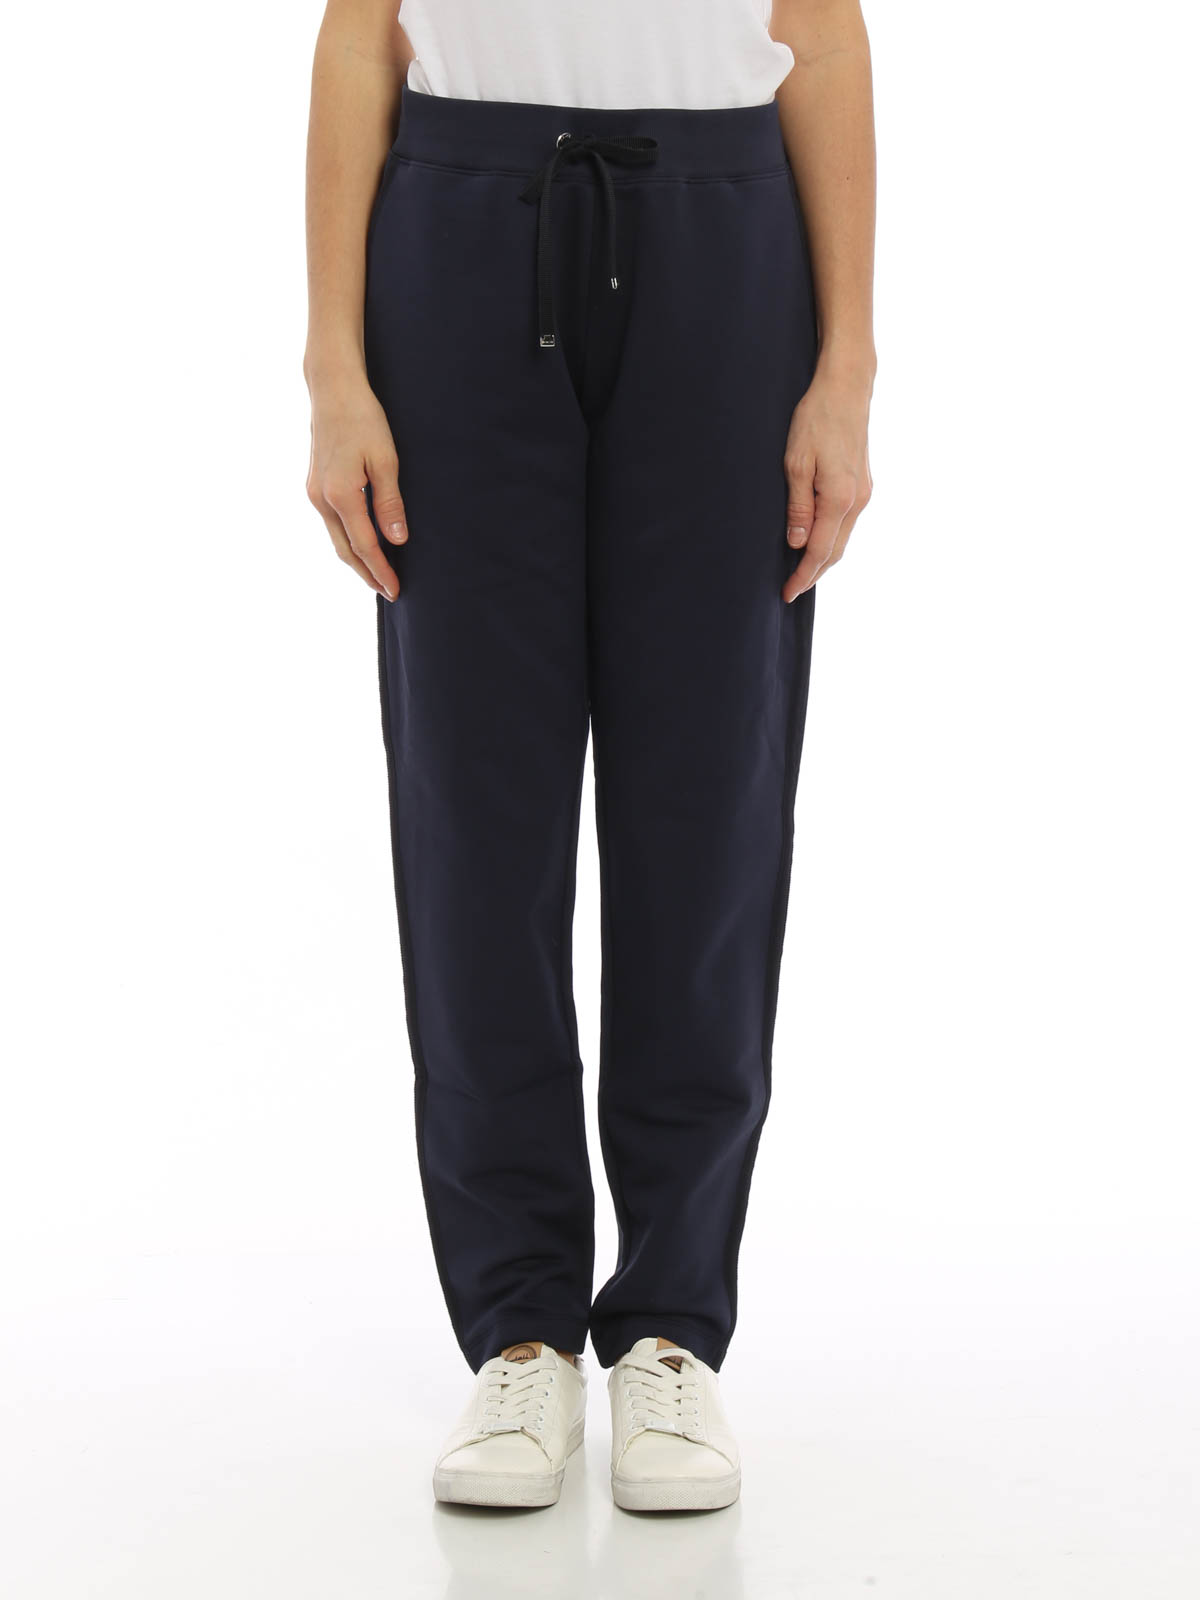 Moncler Pantalones De Chᄄᄁndal Mujer